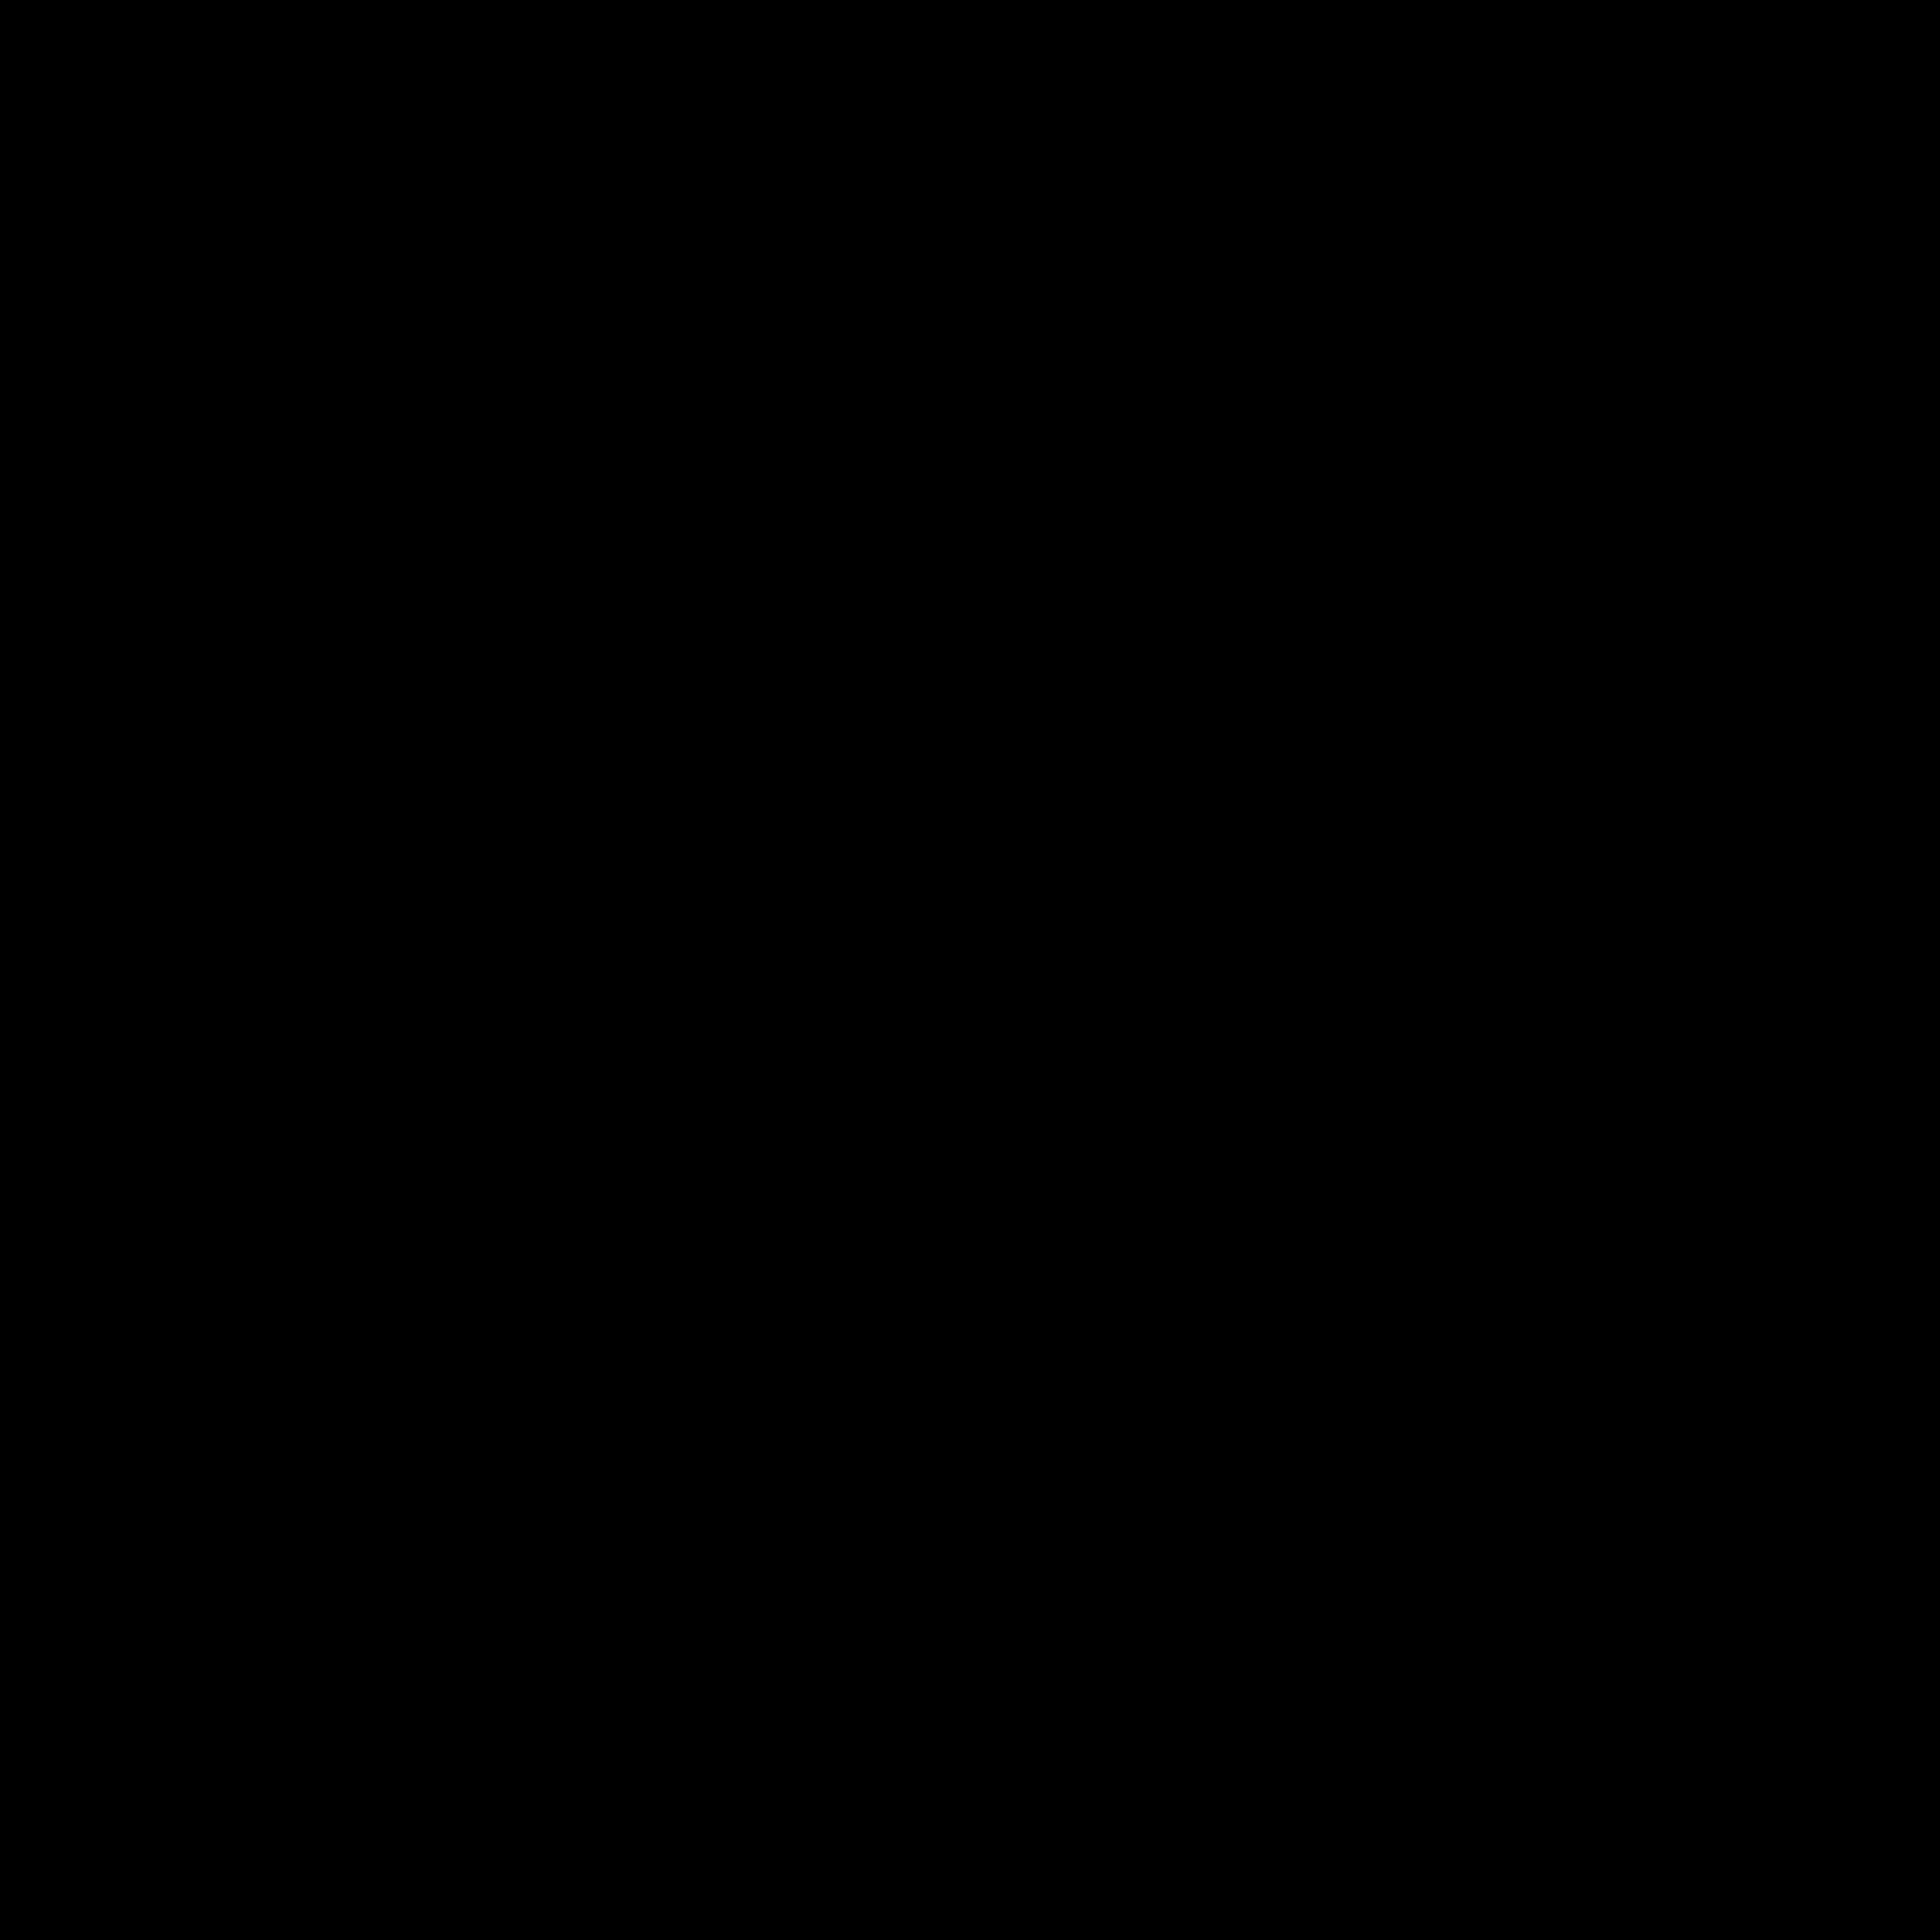 Logo_(R)_Black.png